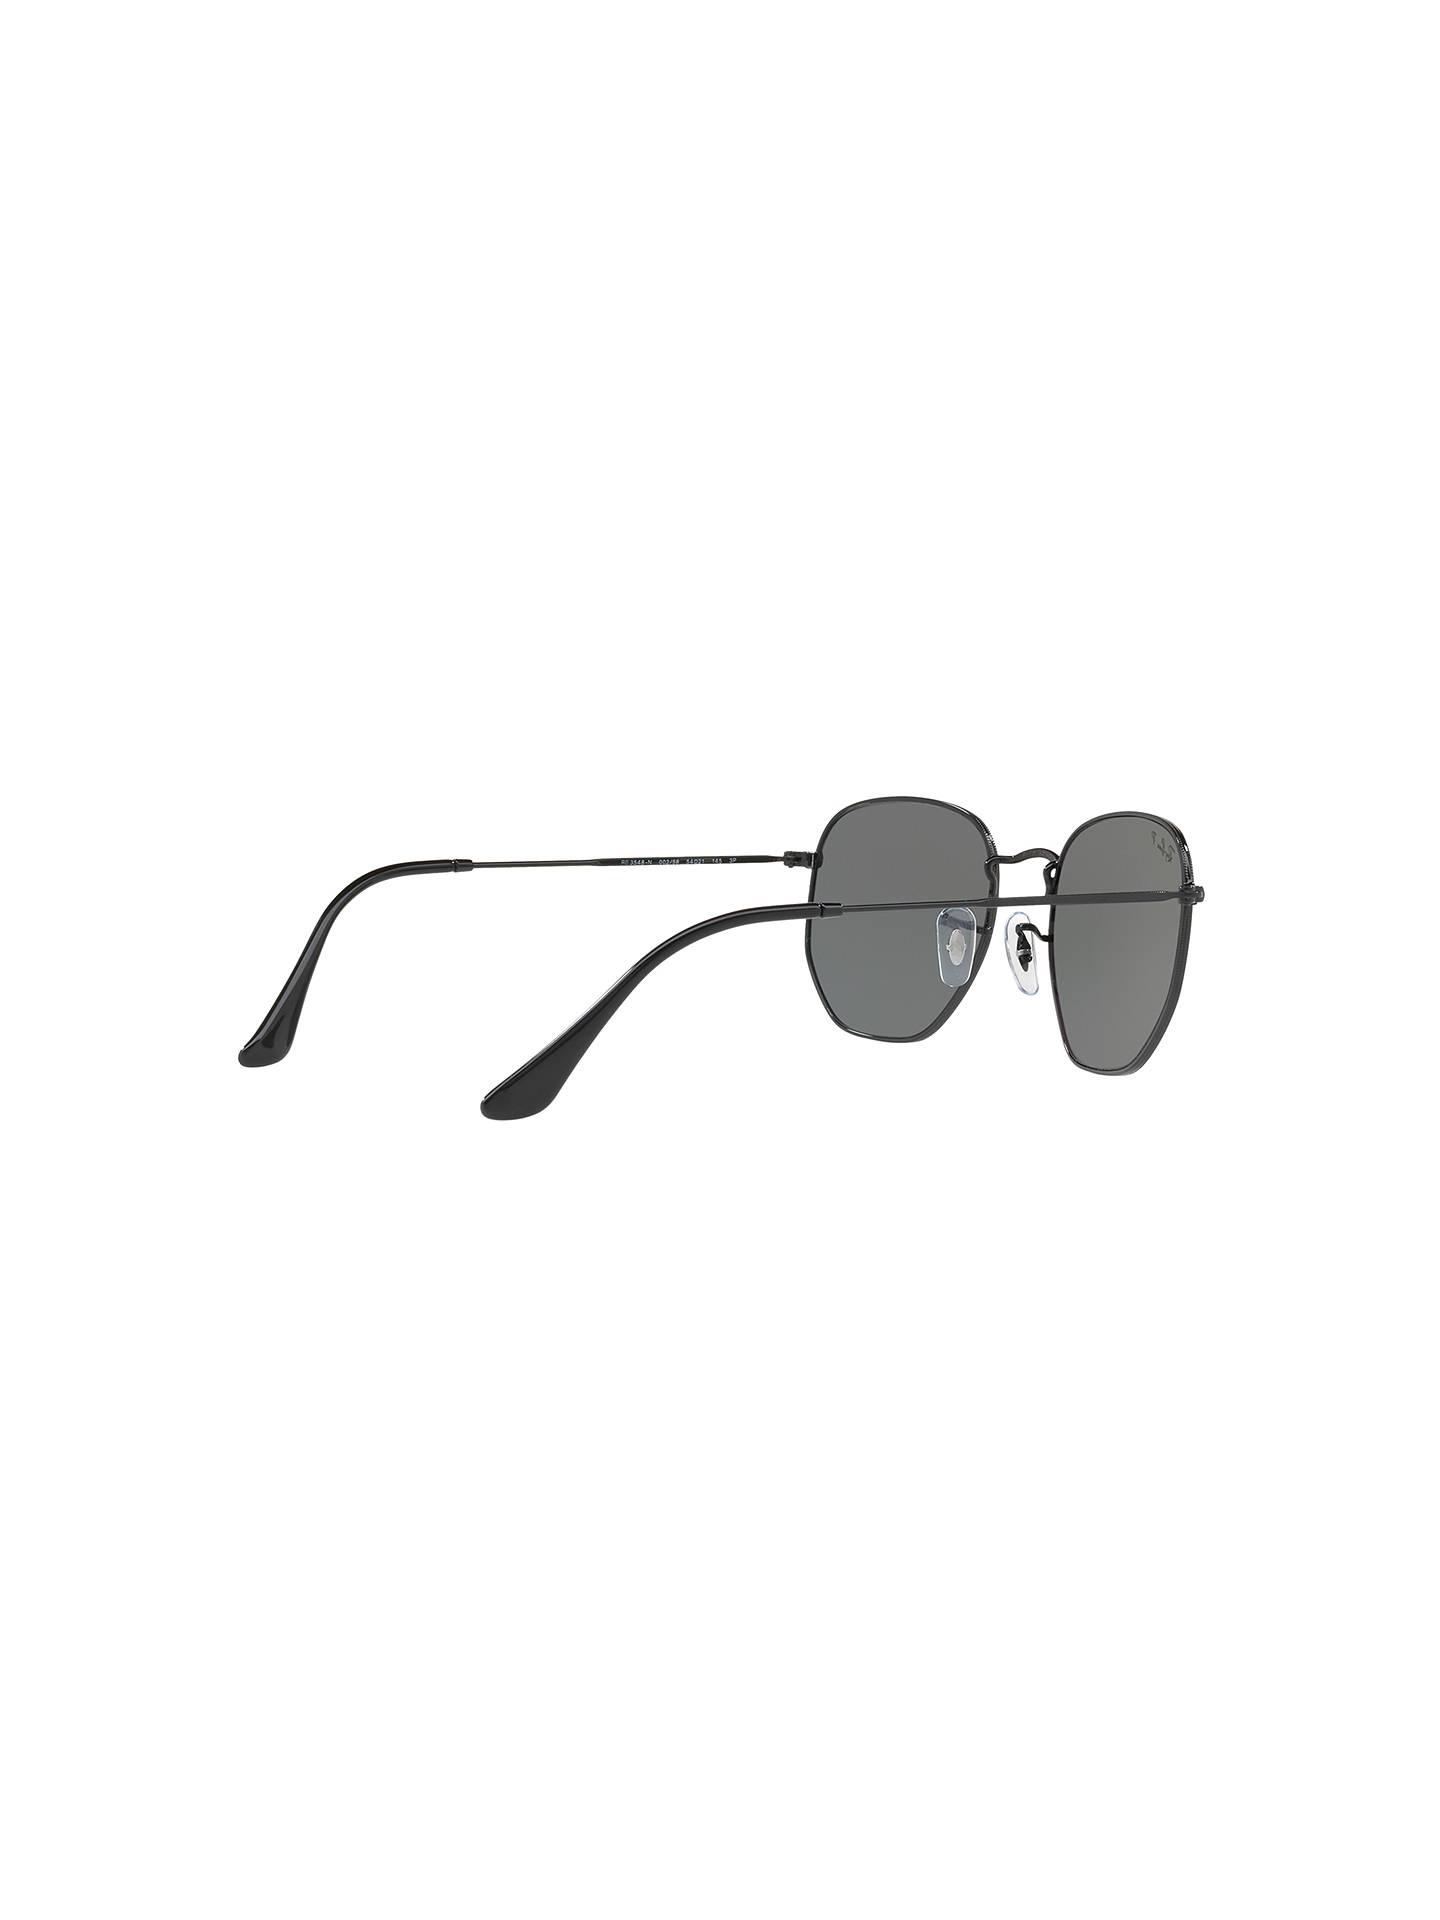 78d6989d41c Ray-Ban RB3548N Polarised Hexagonal Flat Lens Sunglasses at John ...